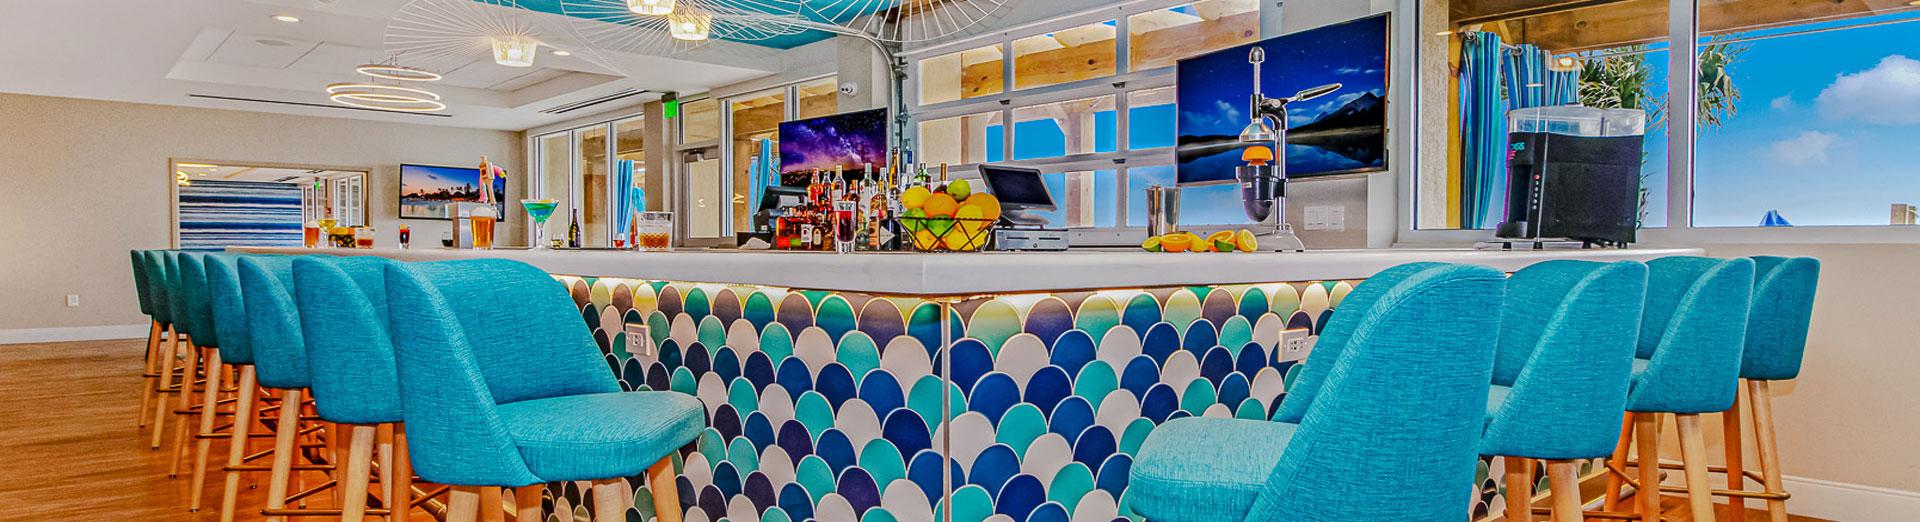 Restaurant & Bar At Holiday Inn Oceanfront At Surfside Beach South Carolina